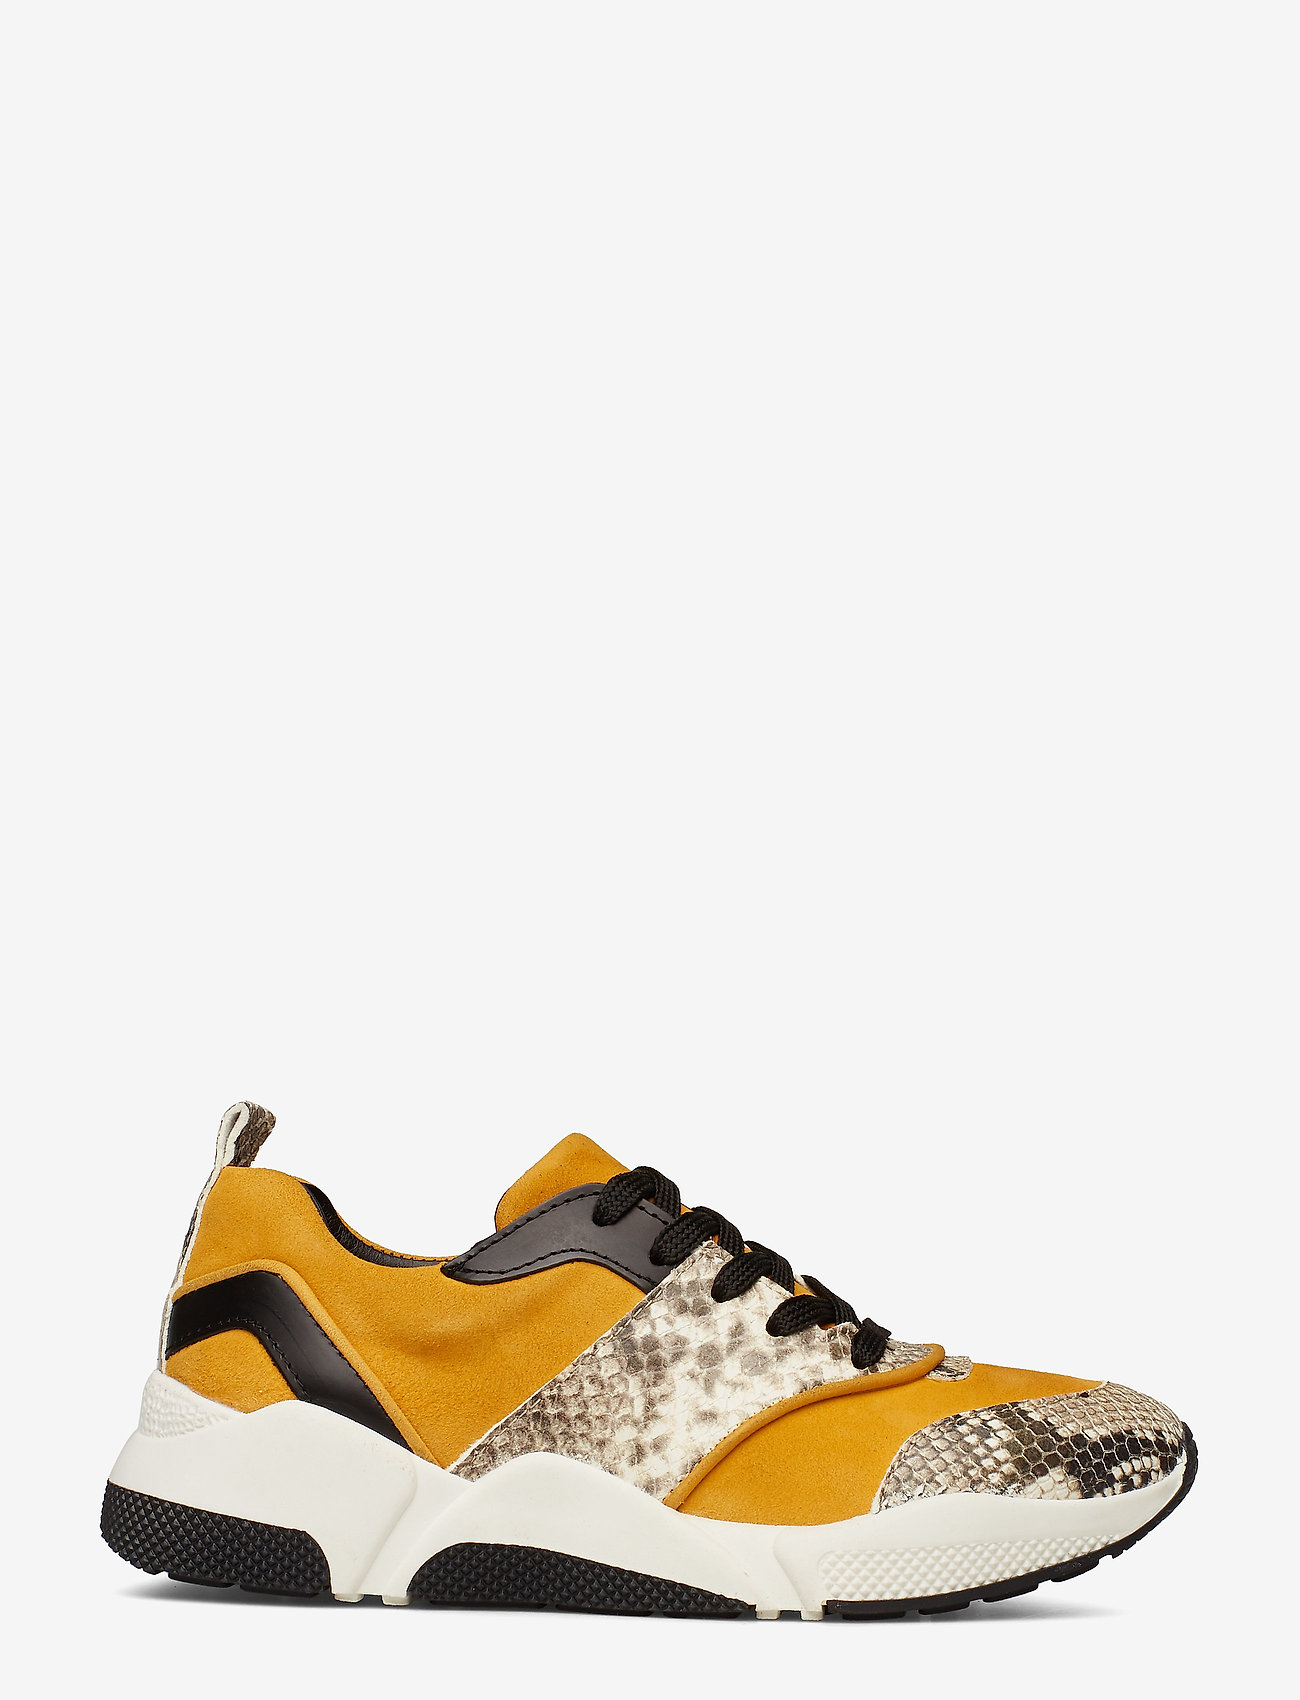 Billi Bi Sport 8840 - Sneakers Off Wh.snake/saffran/black 356